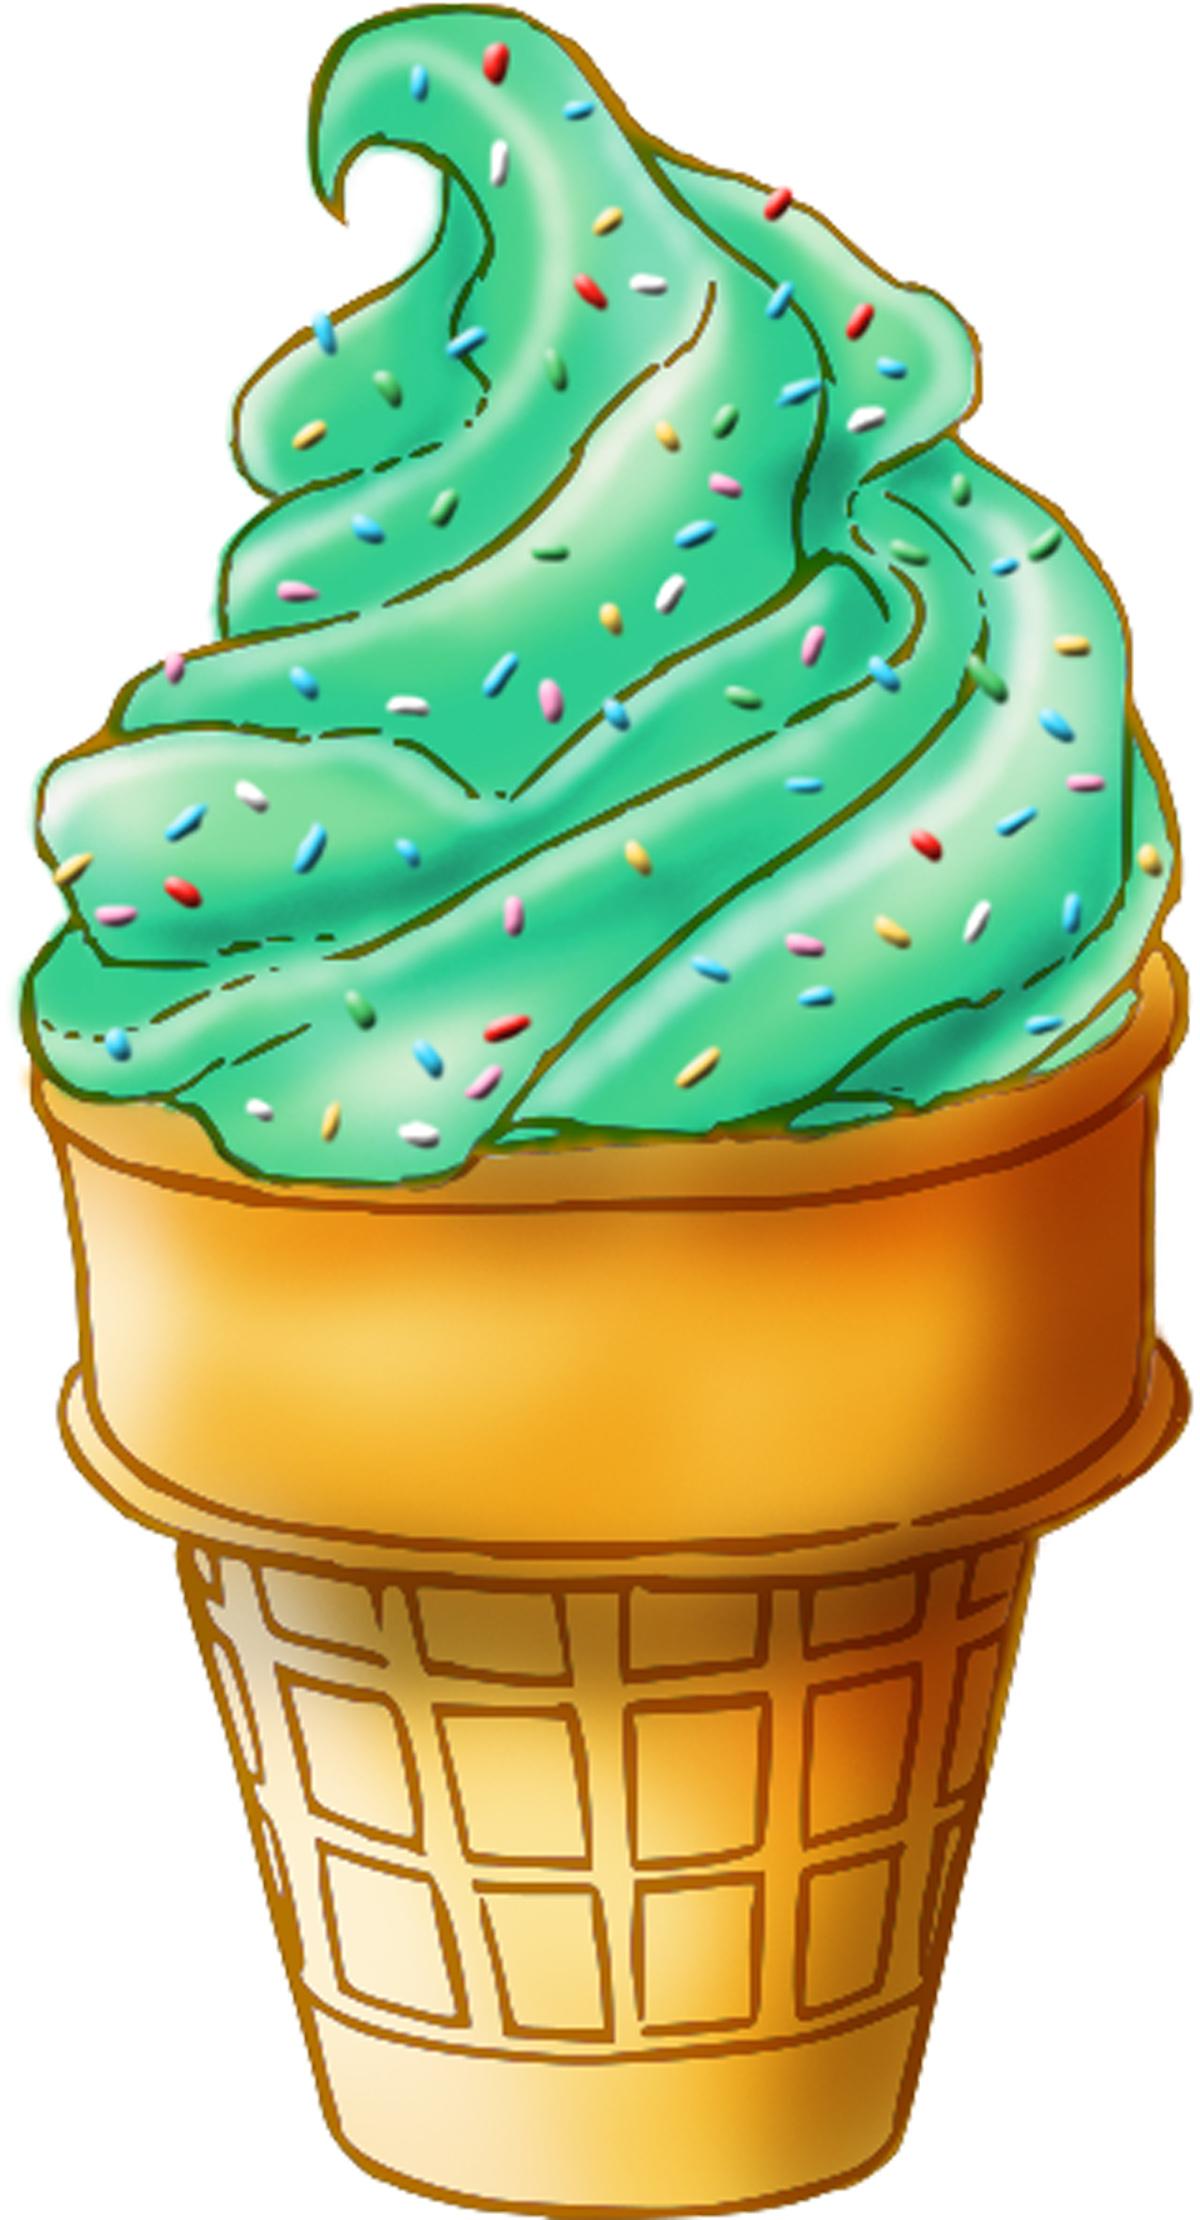 Mint clipart chocolate ice cream Cream no background Green Cliparts